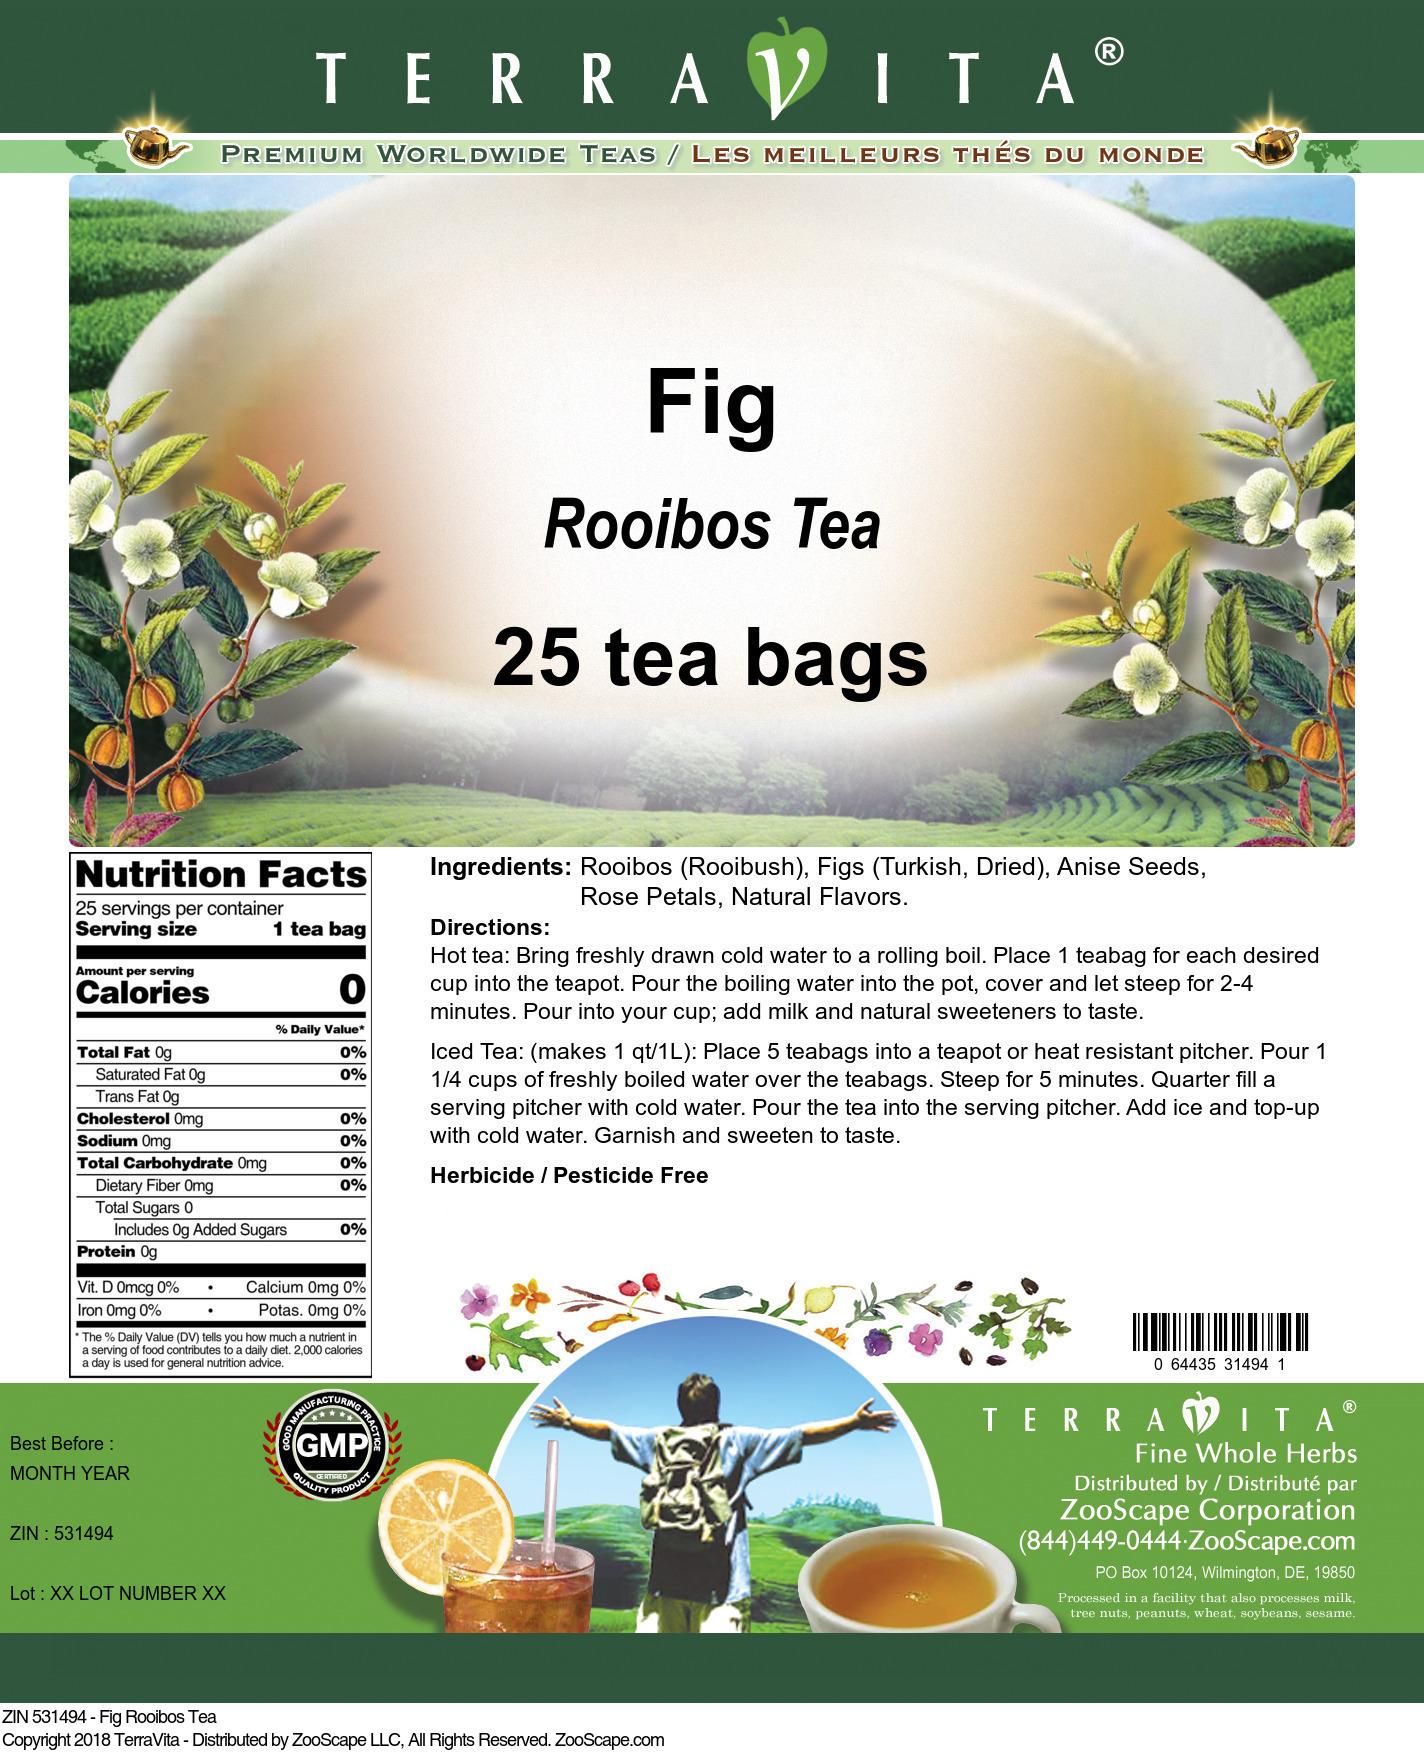 Fig Rooibos Tea